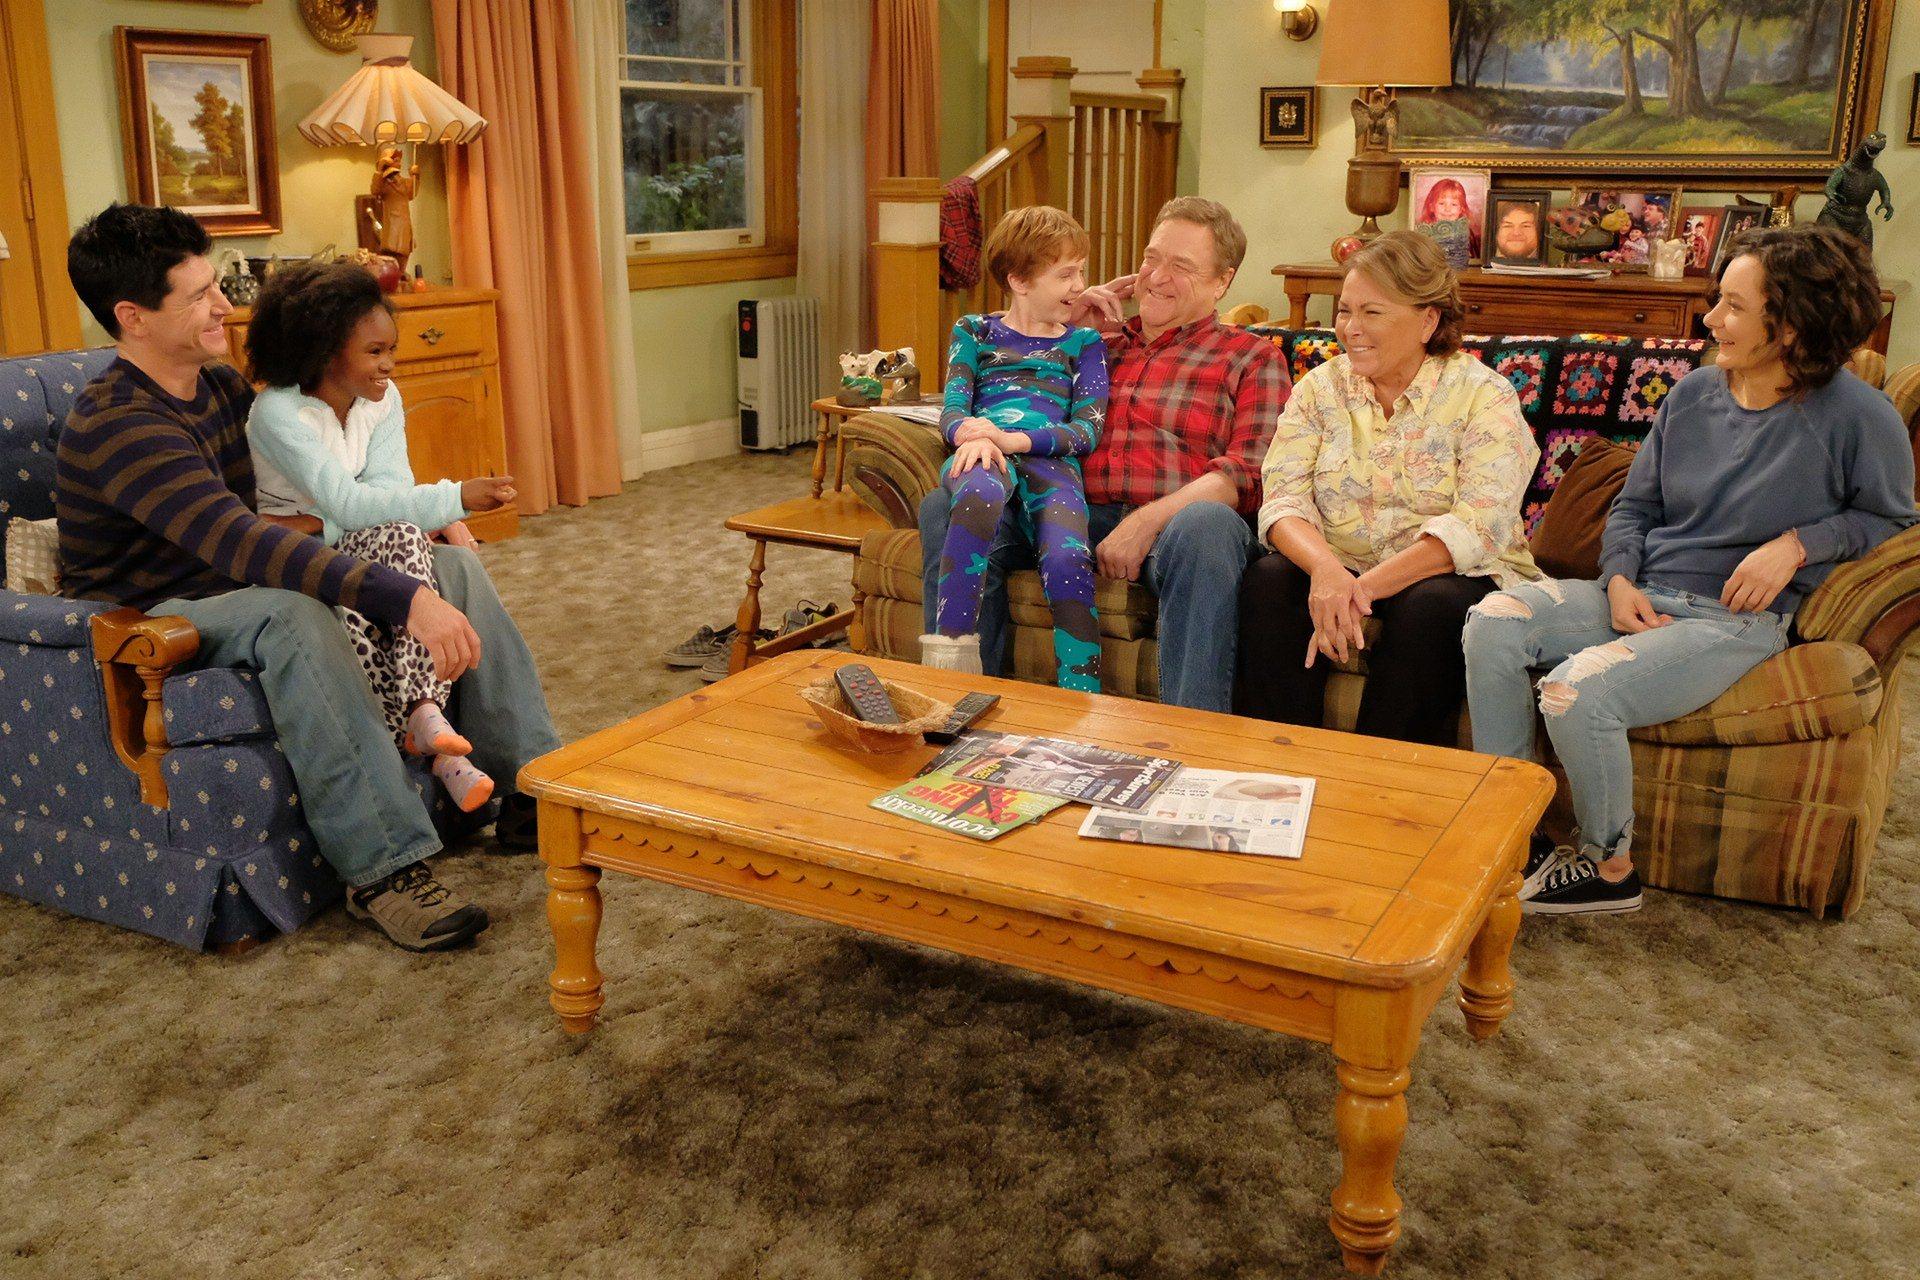 Roseanne family reboot